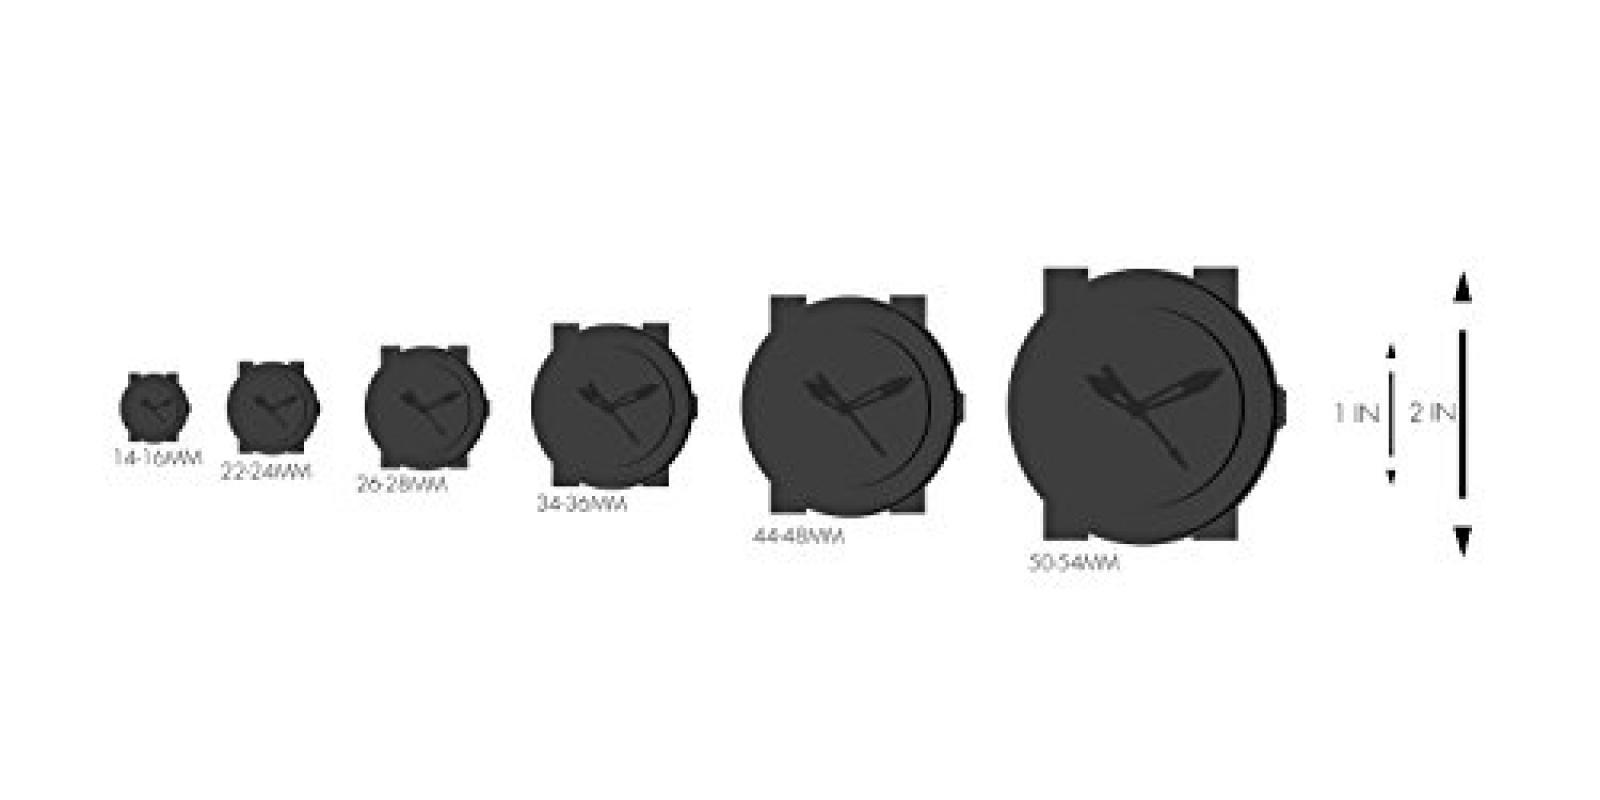 TW-STEEL Armbanduhr Canteen Style TW-5